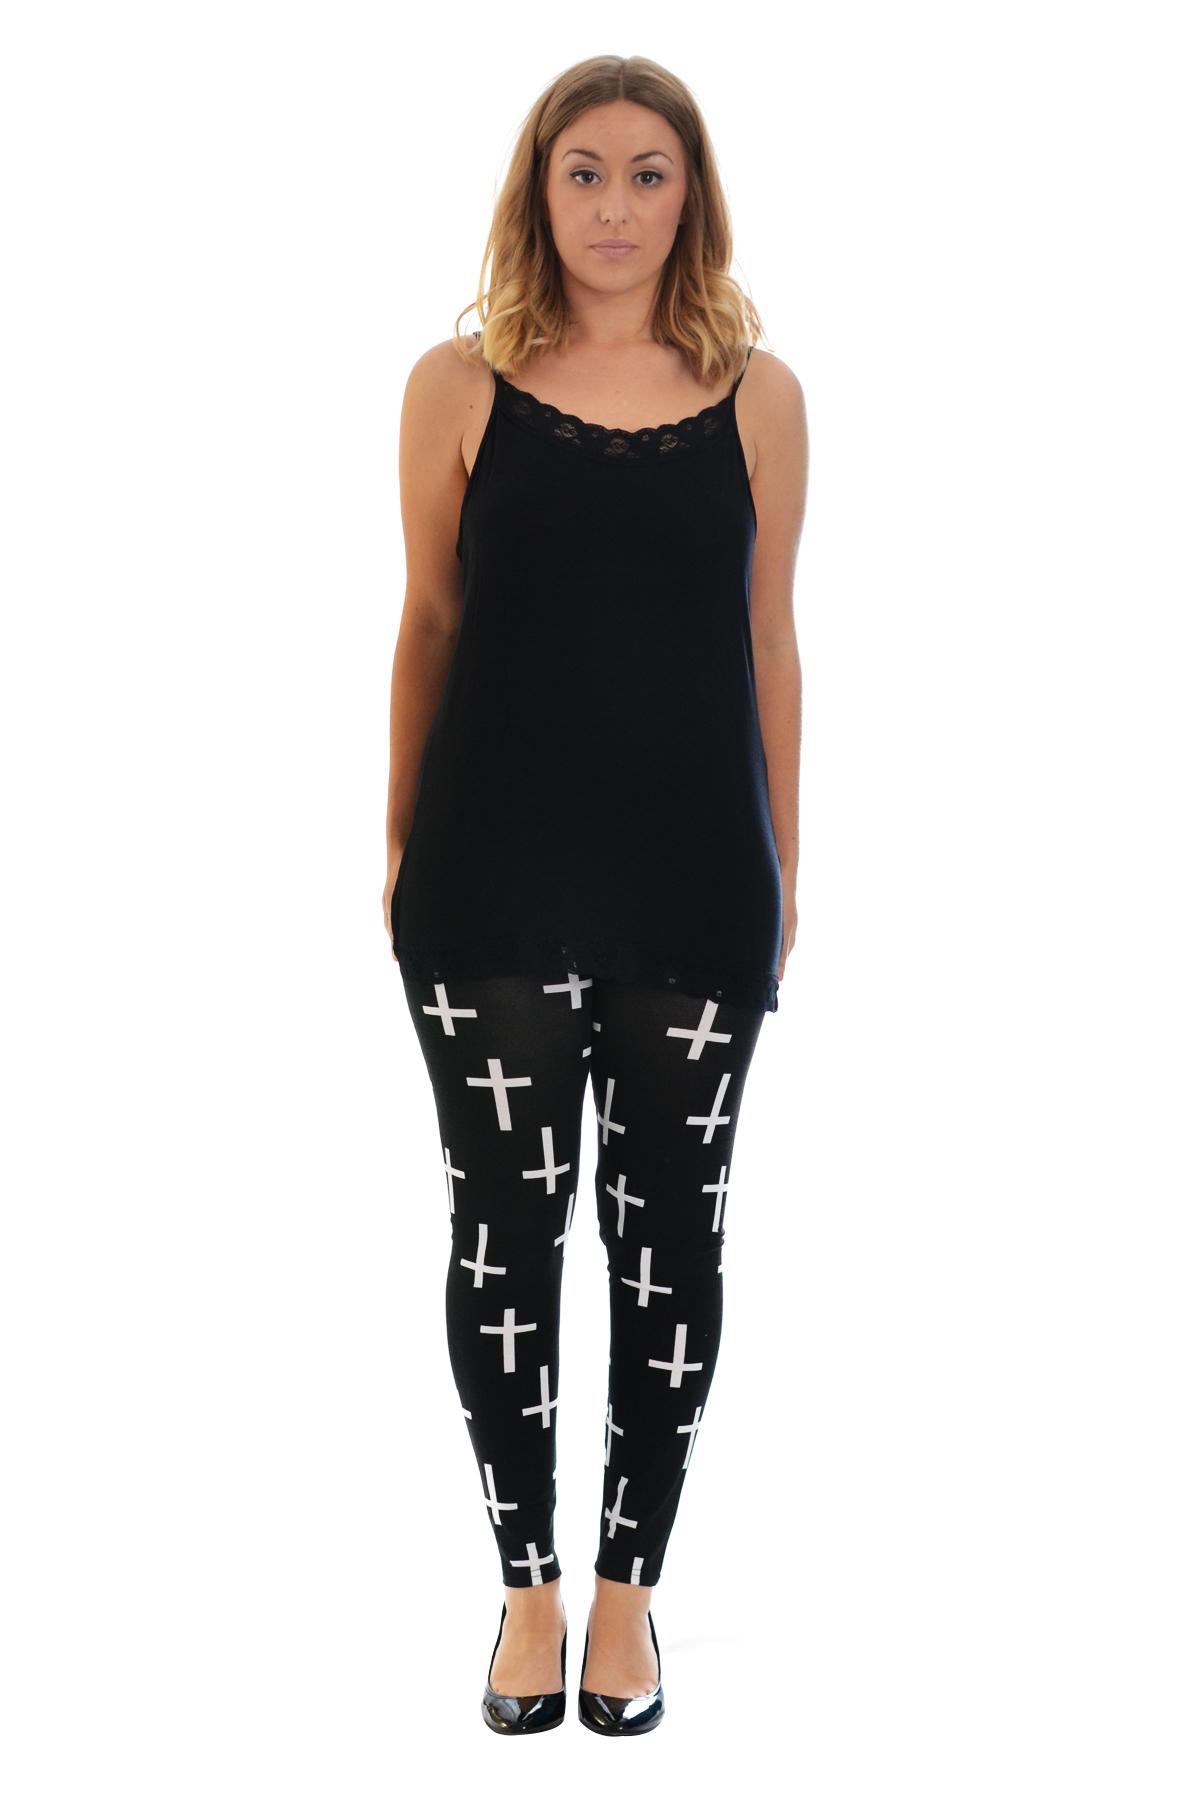 Womens Leggings Ladies Plus Size Cross Print Full Length Trouser Gothic Nouvelle